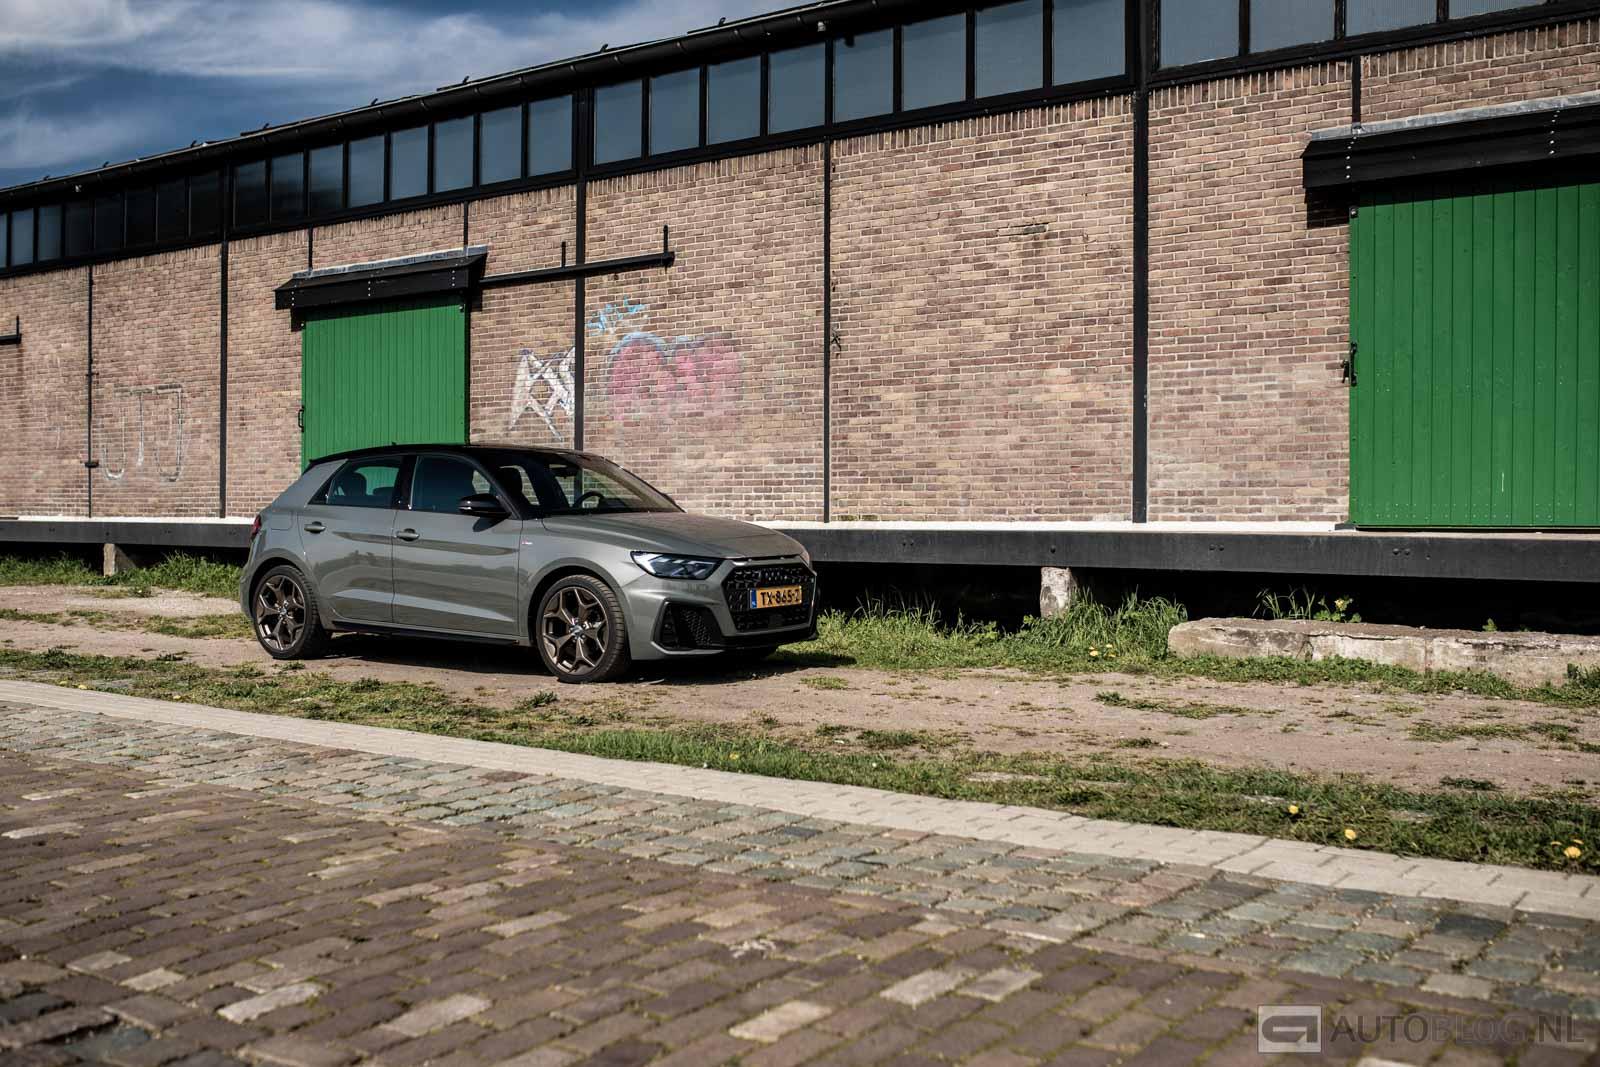 Audi-A1-2019-0285.jpg